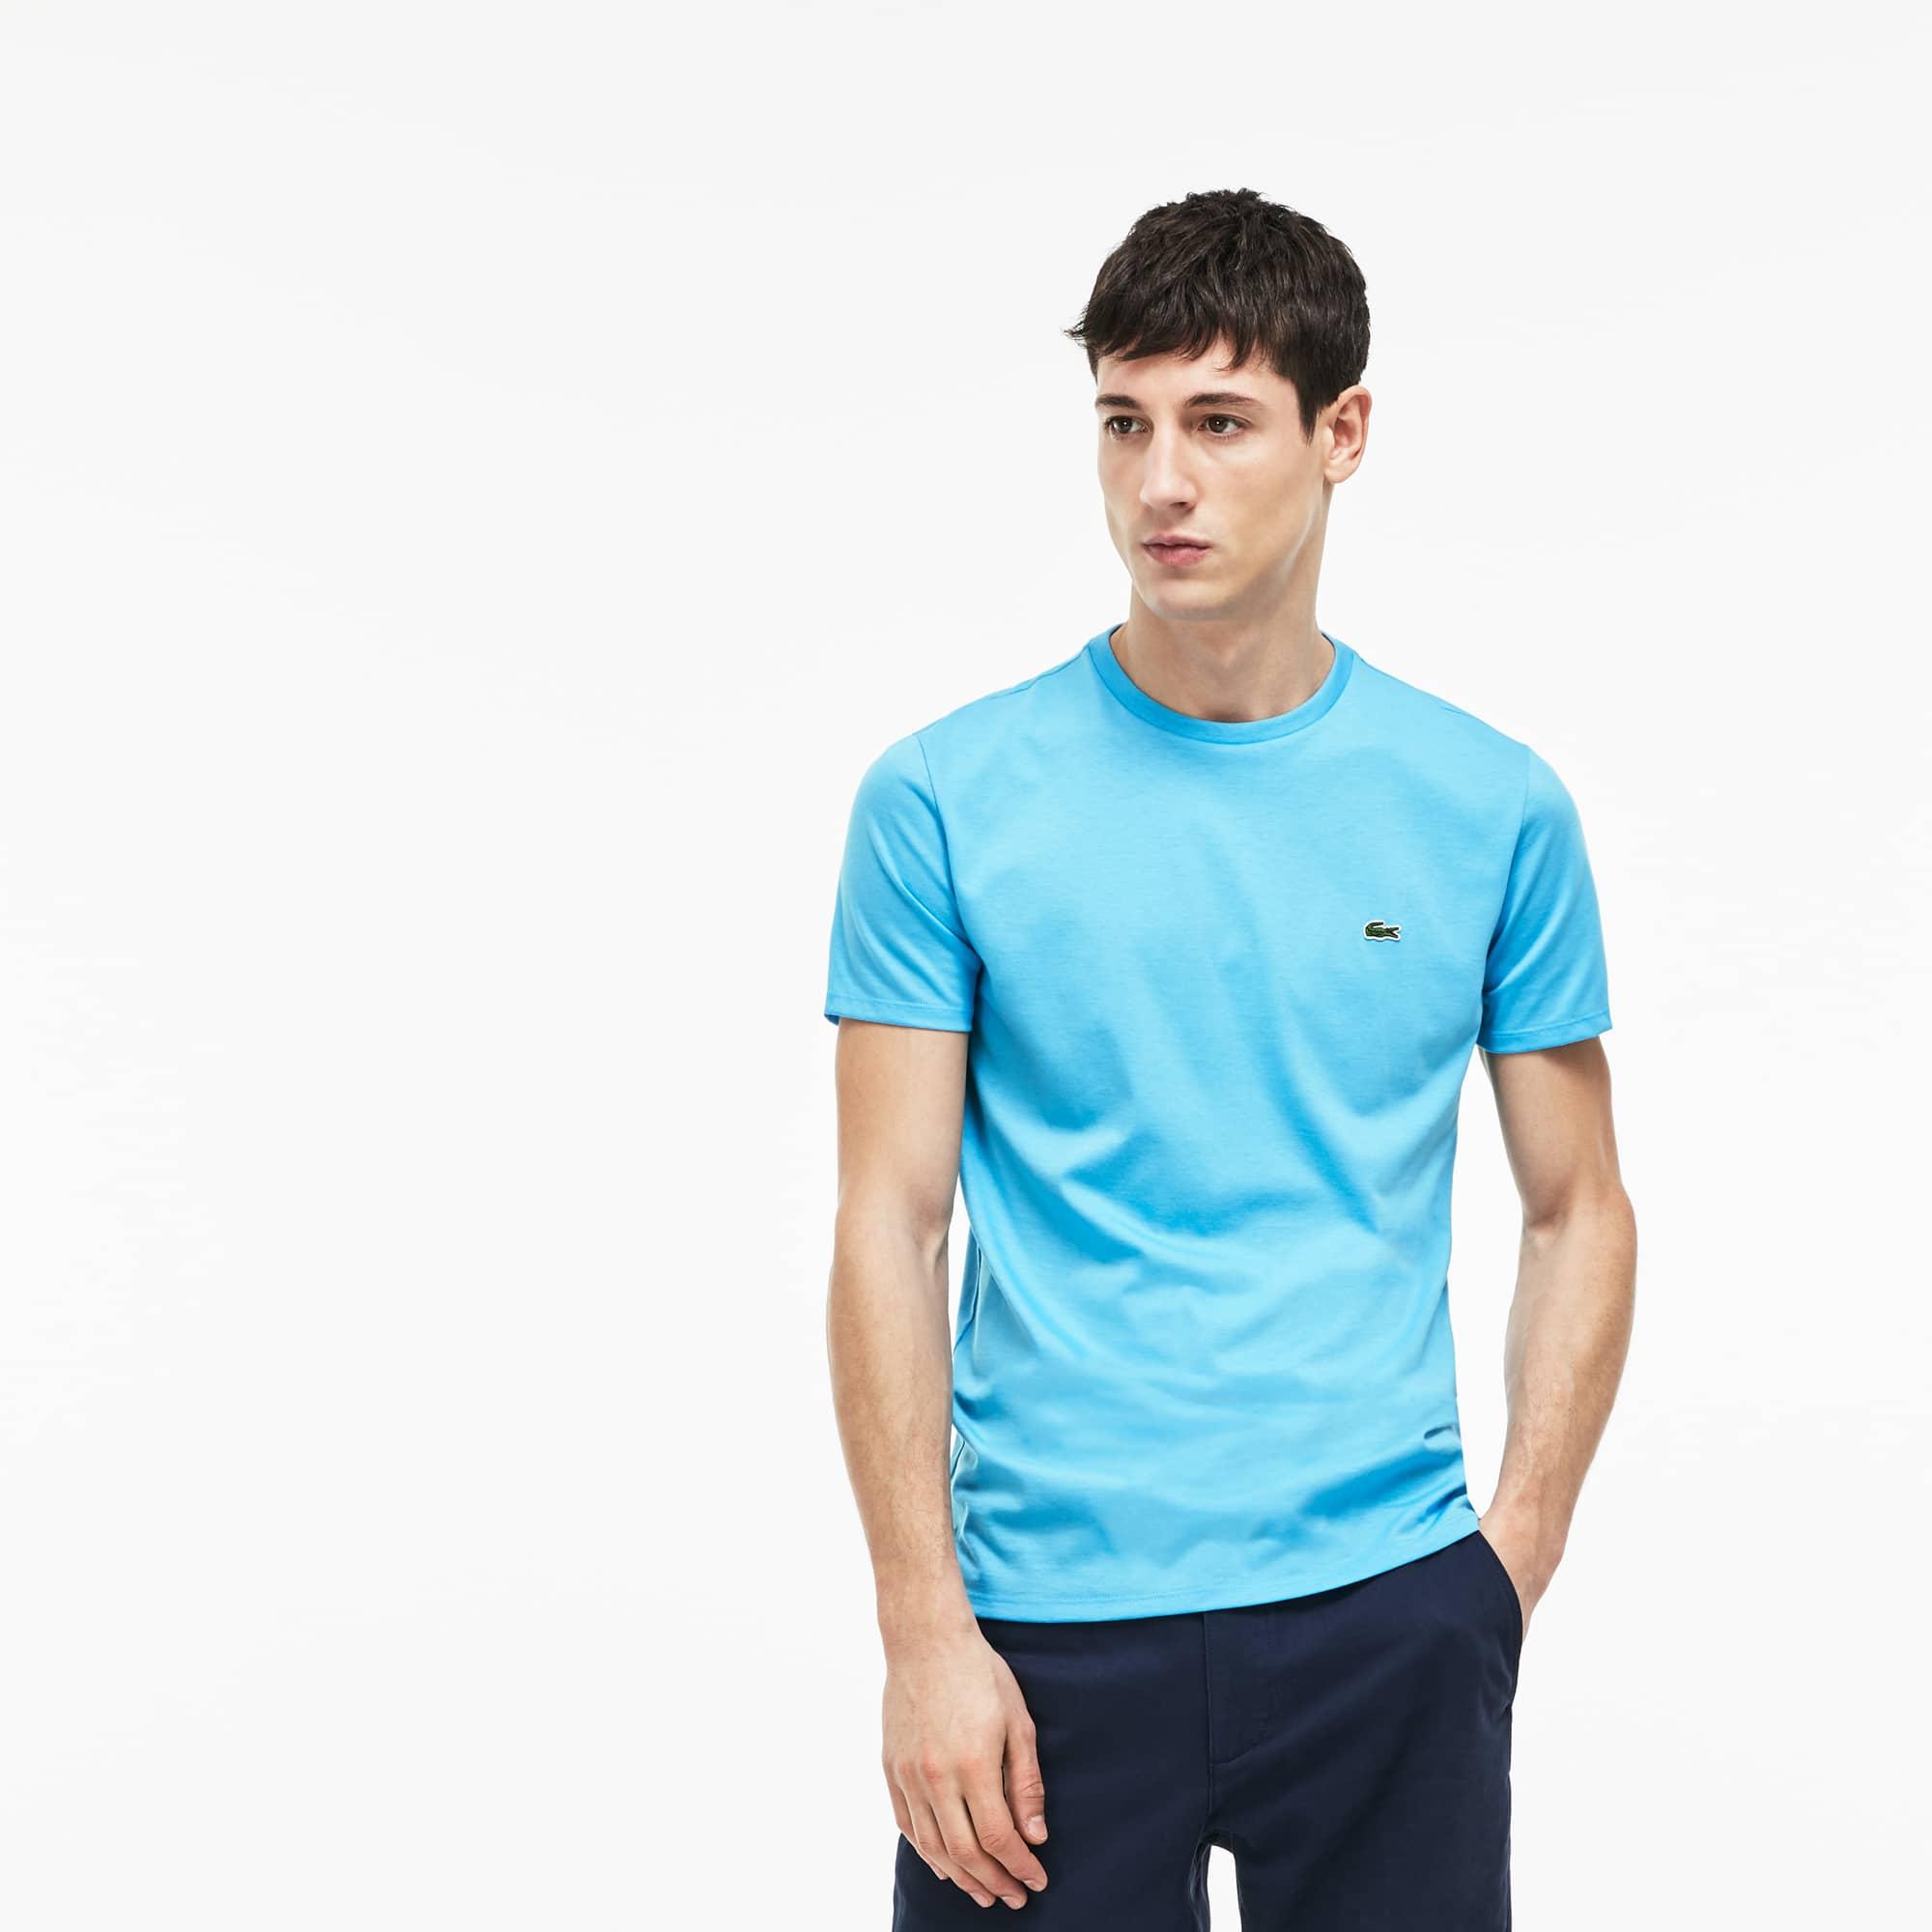 Camisetas  5a3a3c4b7b25b